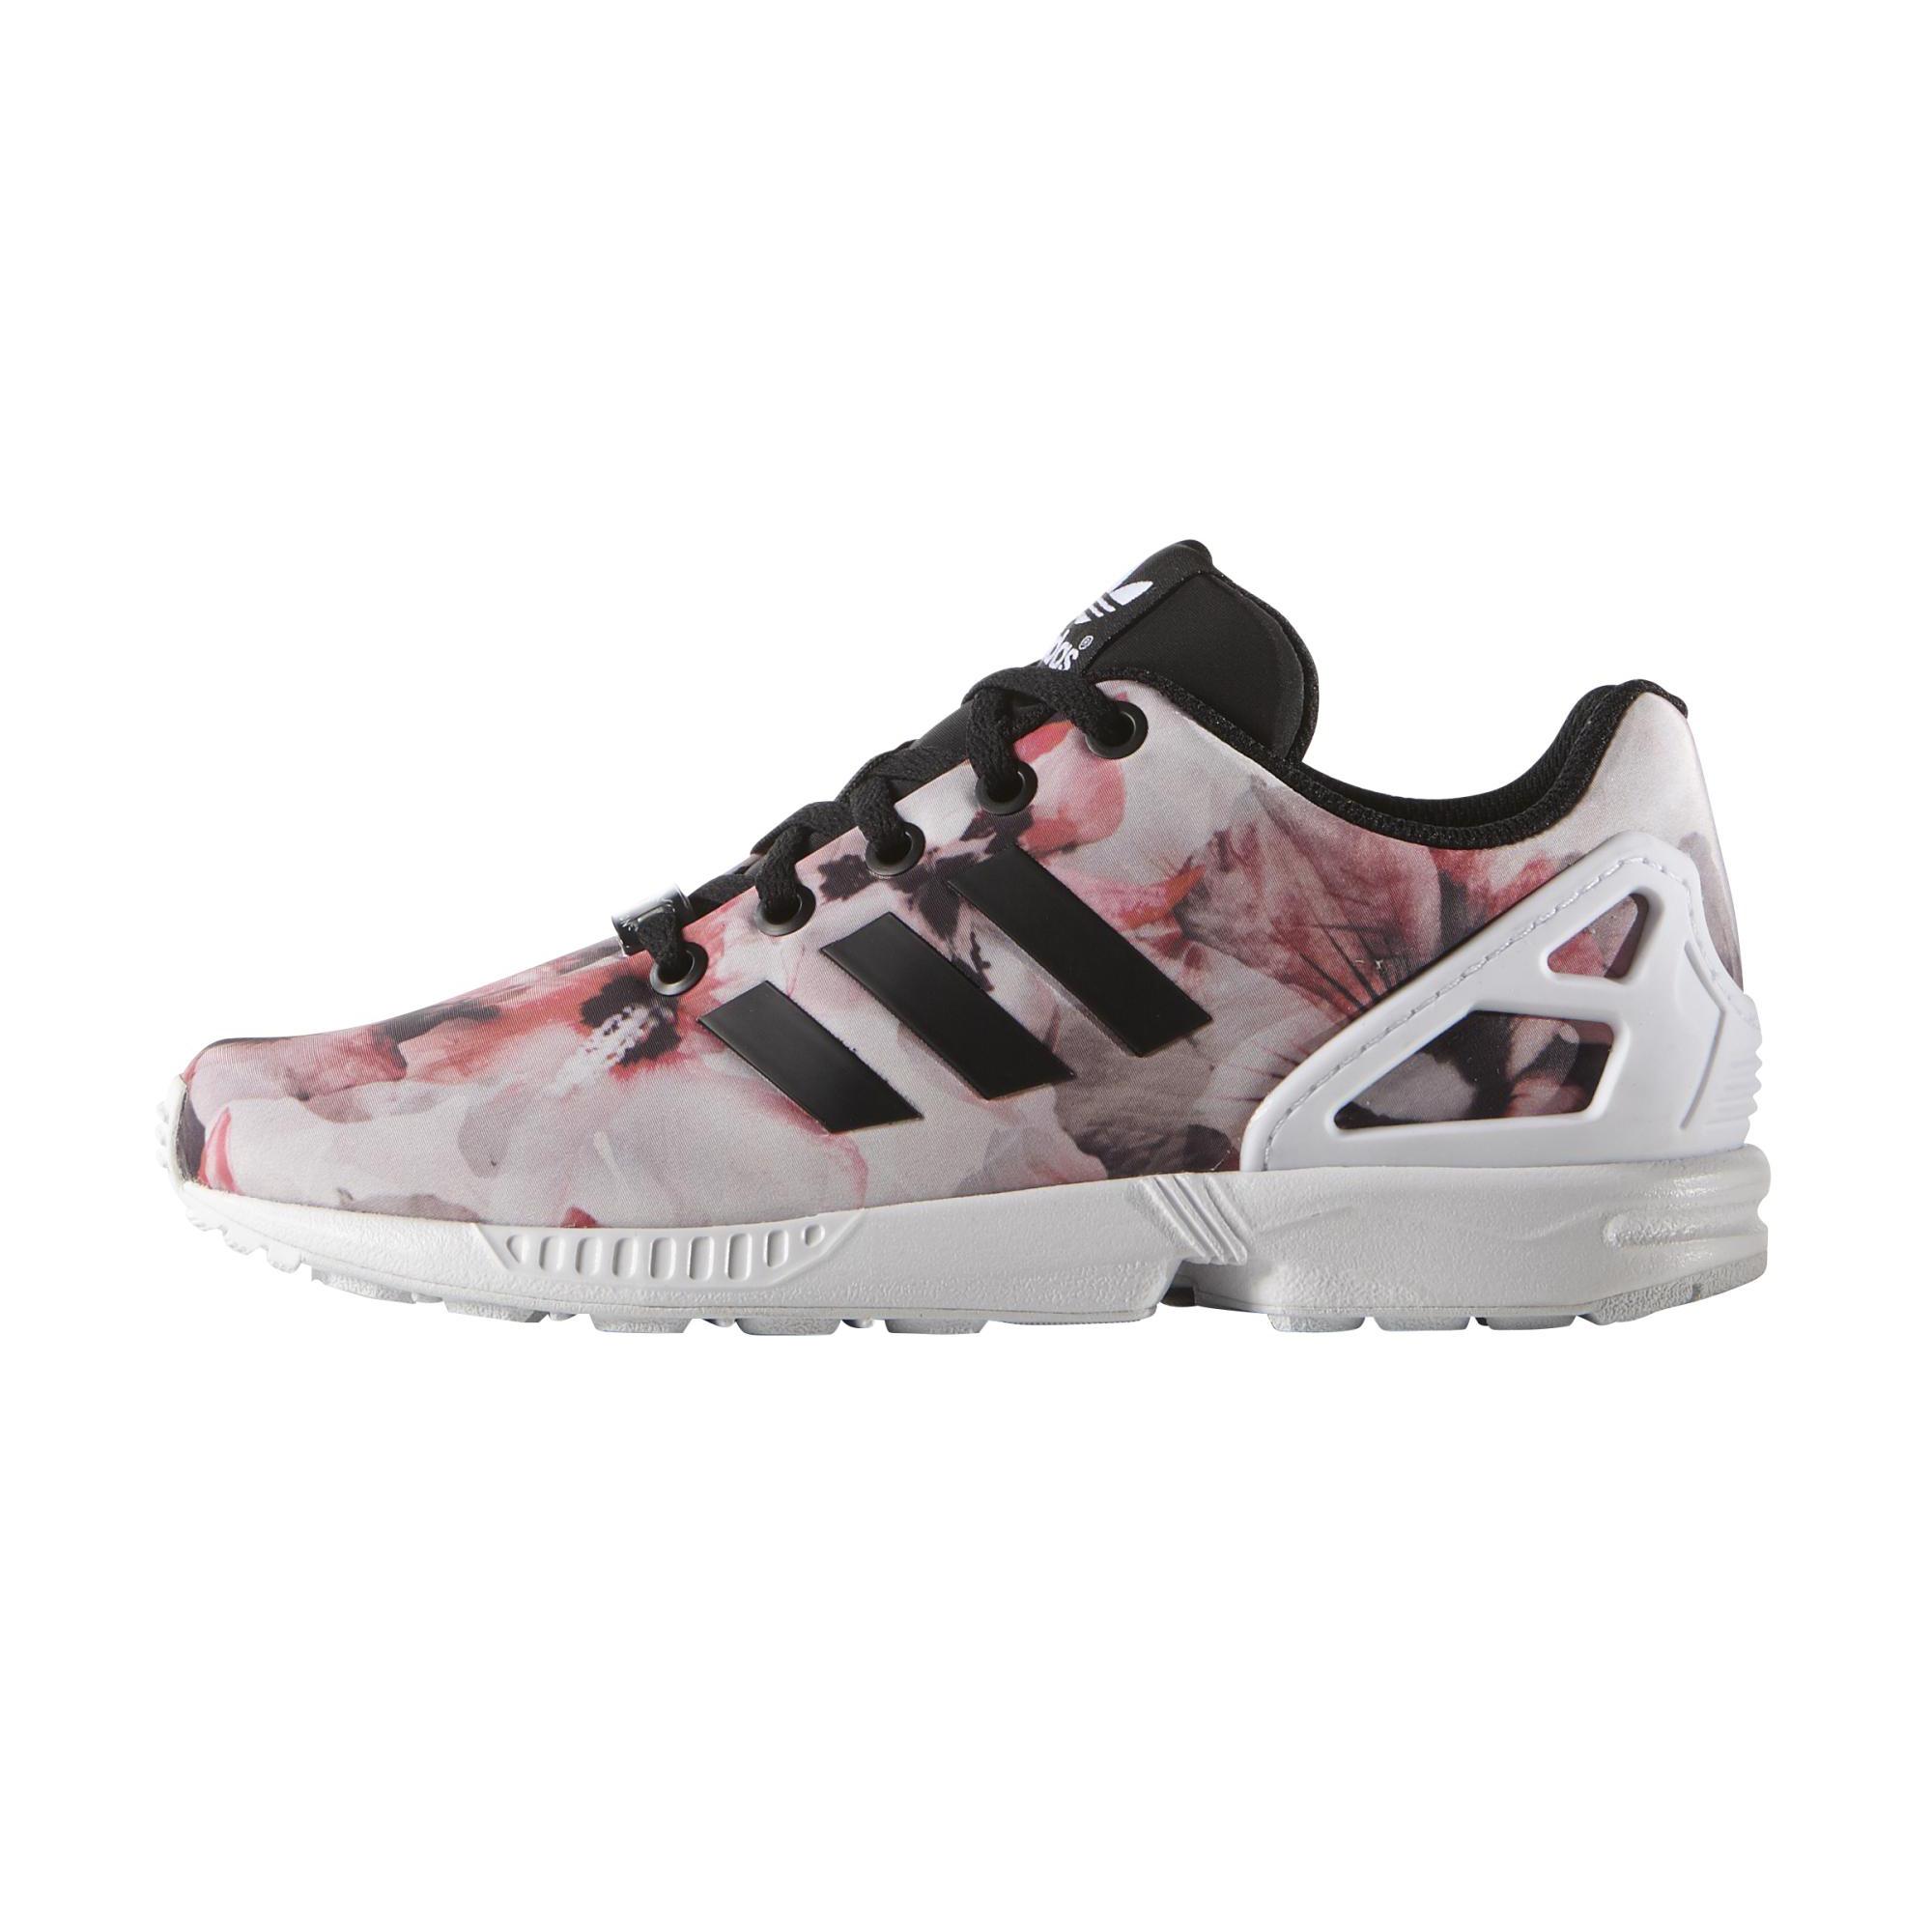 Adidas Baskets Fluxortholite®estampado De Floresrosa Gris Zx cX1md5